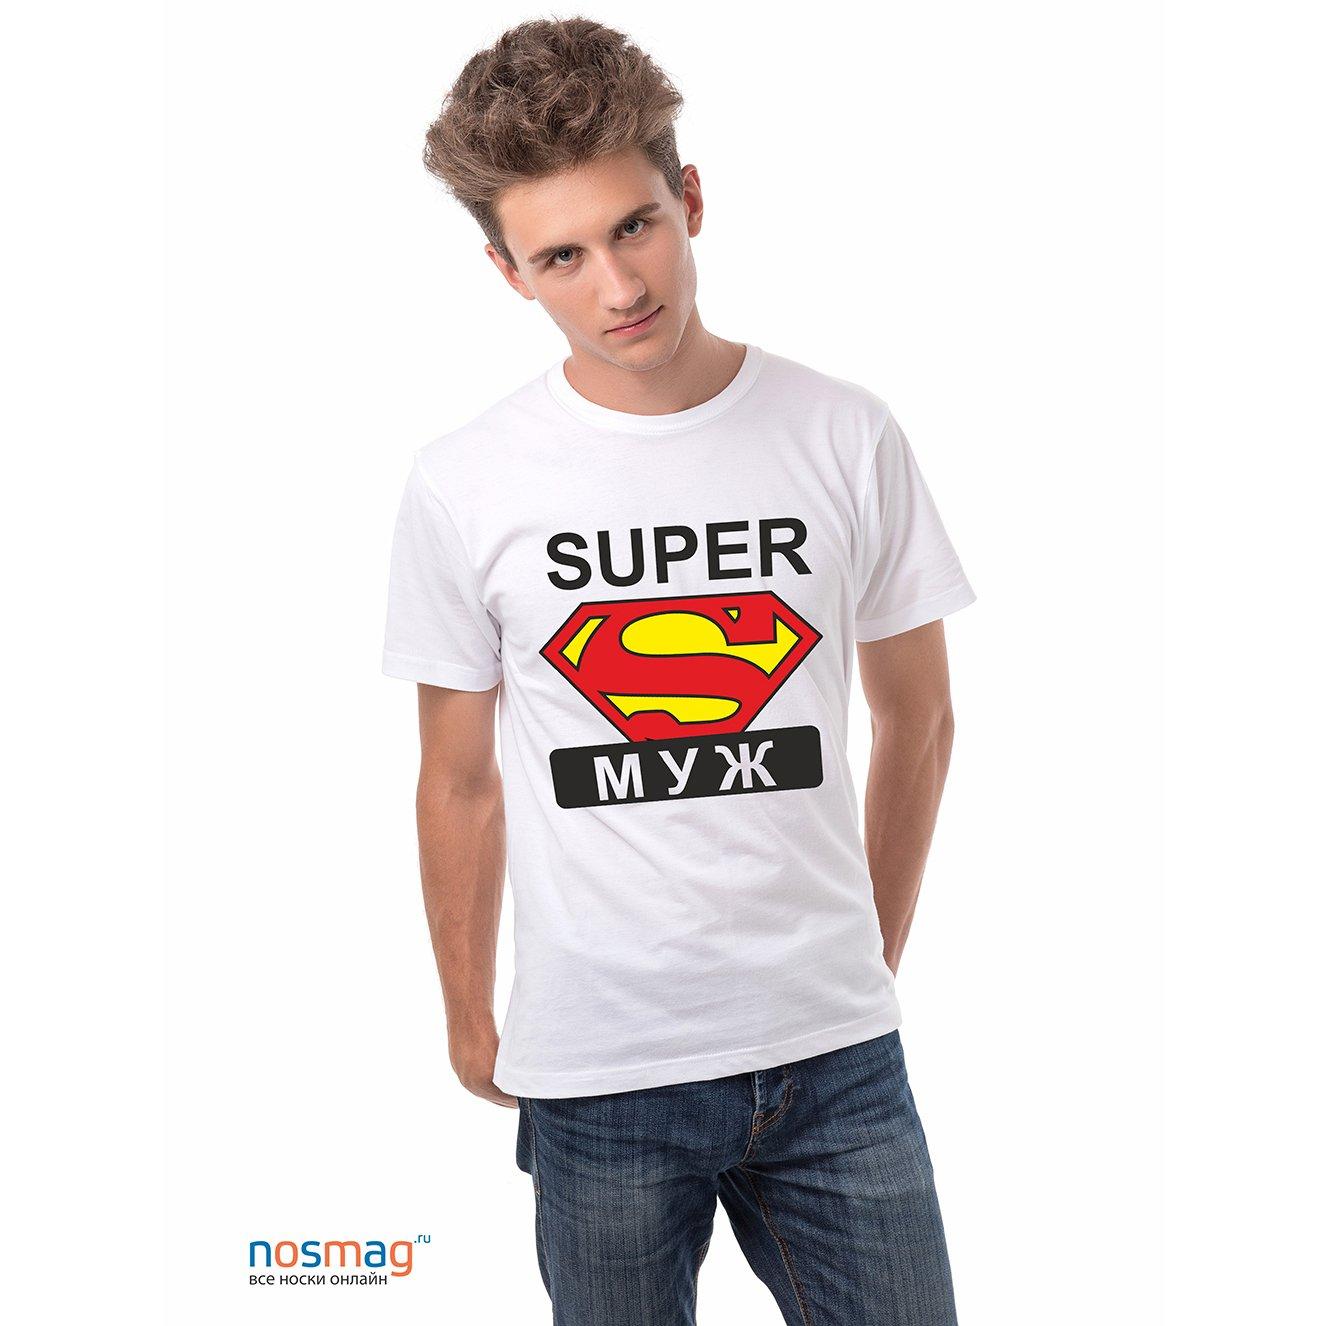 Мужская футболка с рисунком Супер муж